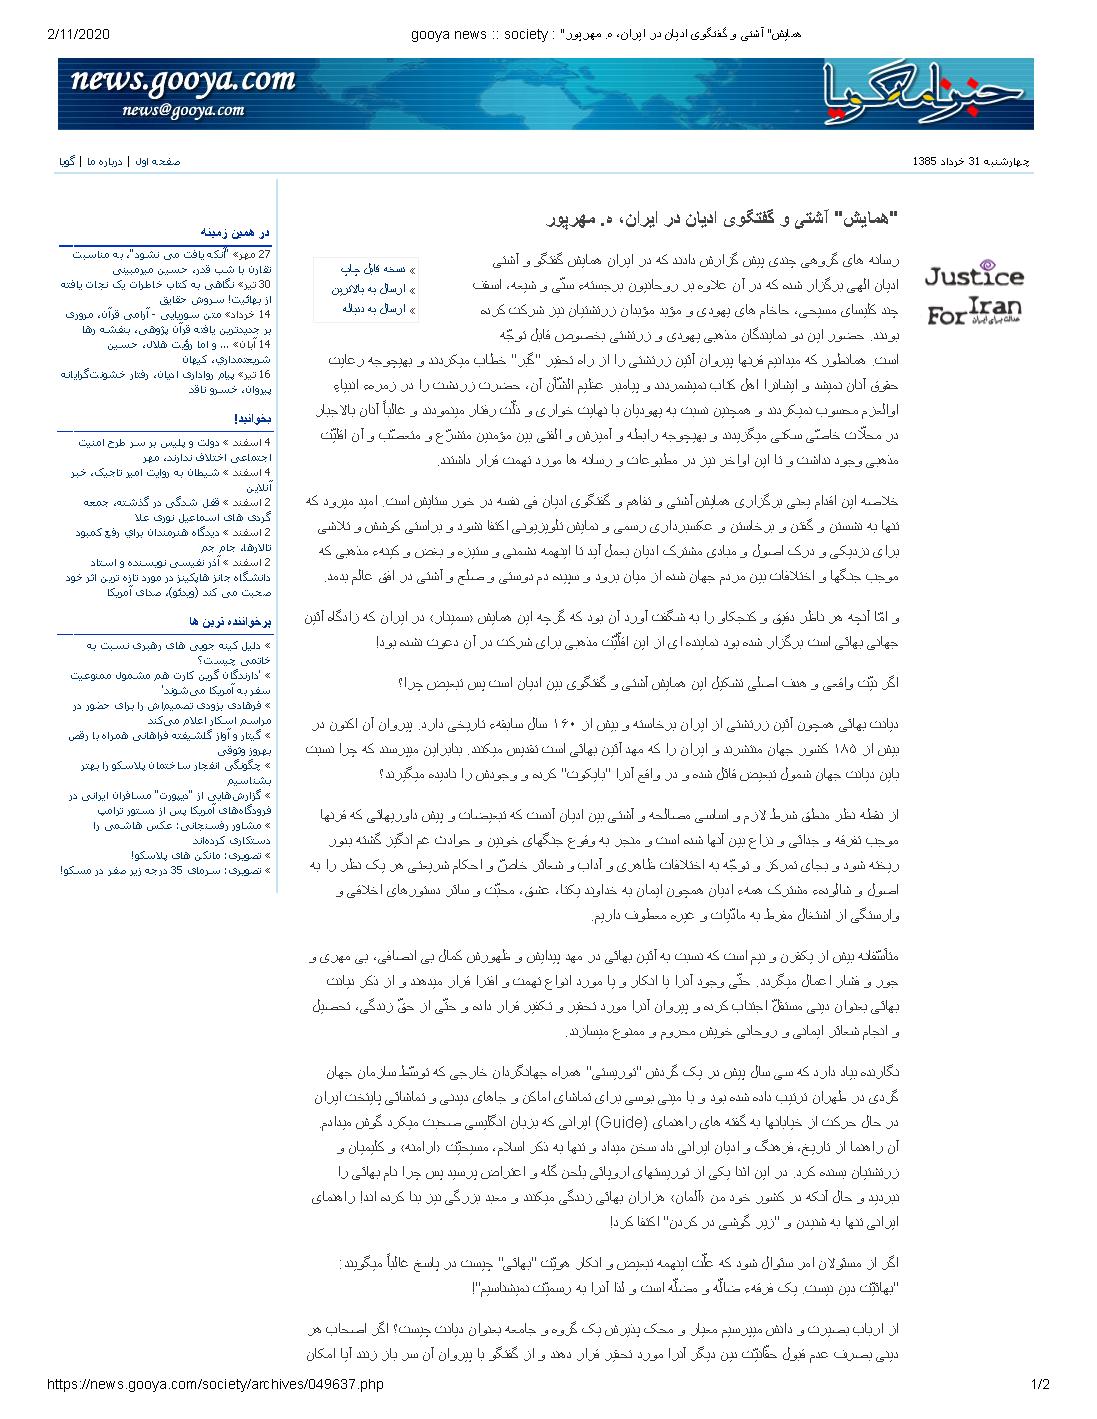 Gooya News Telegram